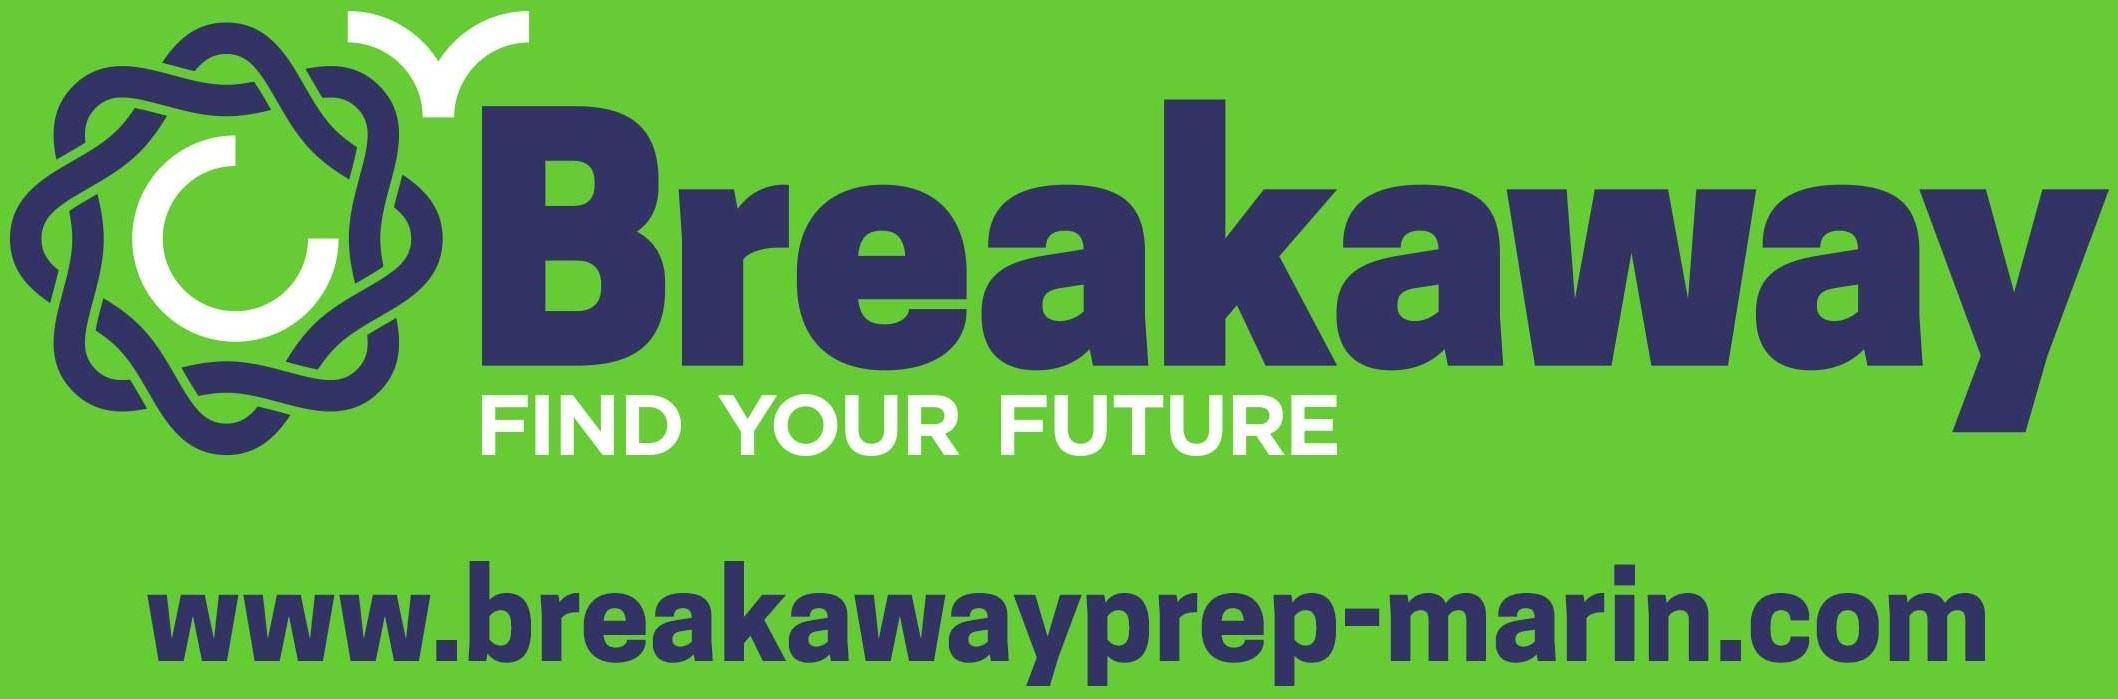 breakawat.jpg